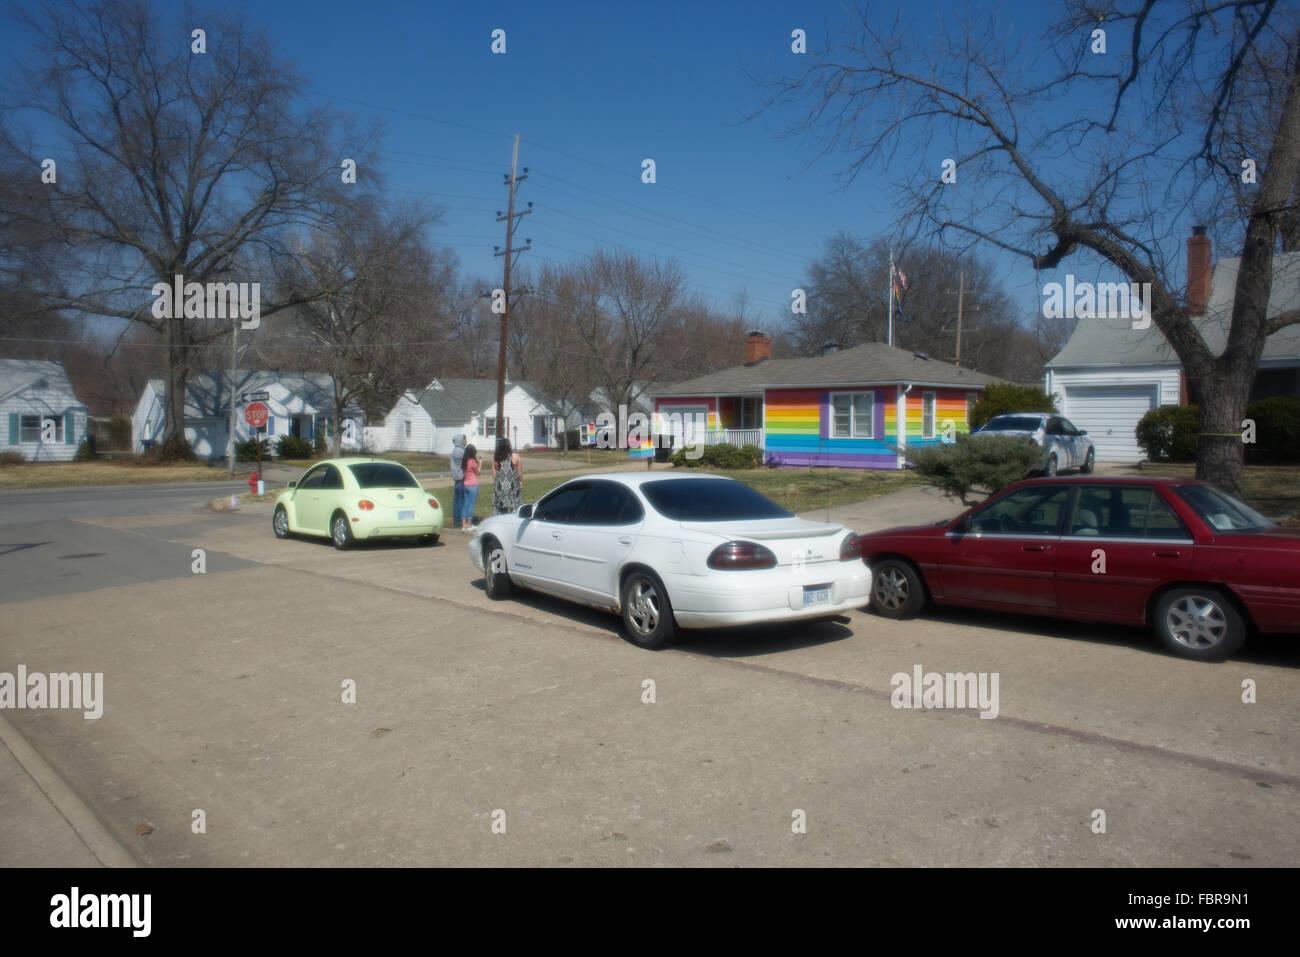 Topeka, Kansas, USA, 29th March, 2014 The Rainbow House Topeka Kansas. Aaron Jackson, one of the founders of Planting Stock Photo